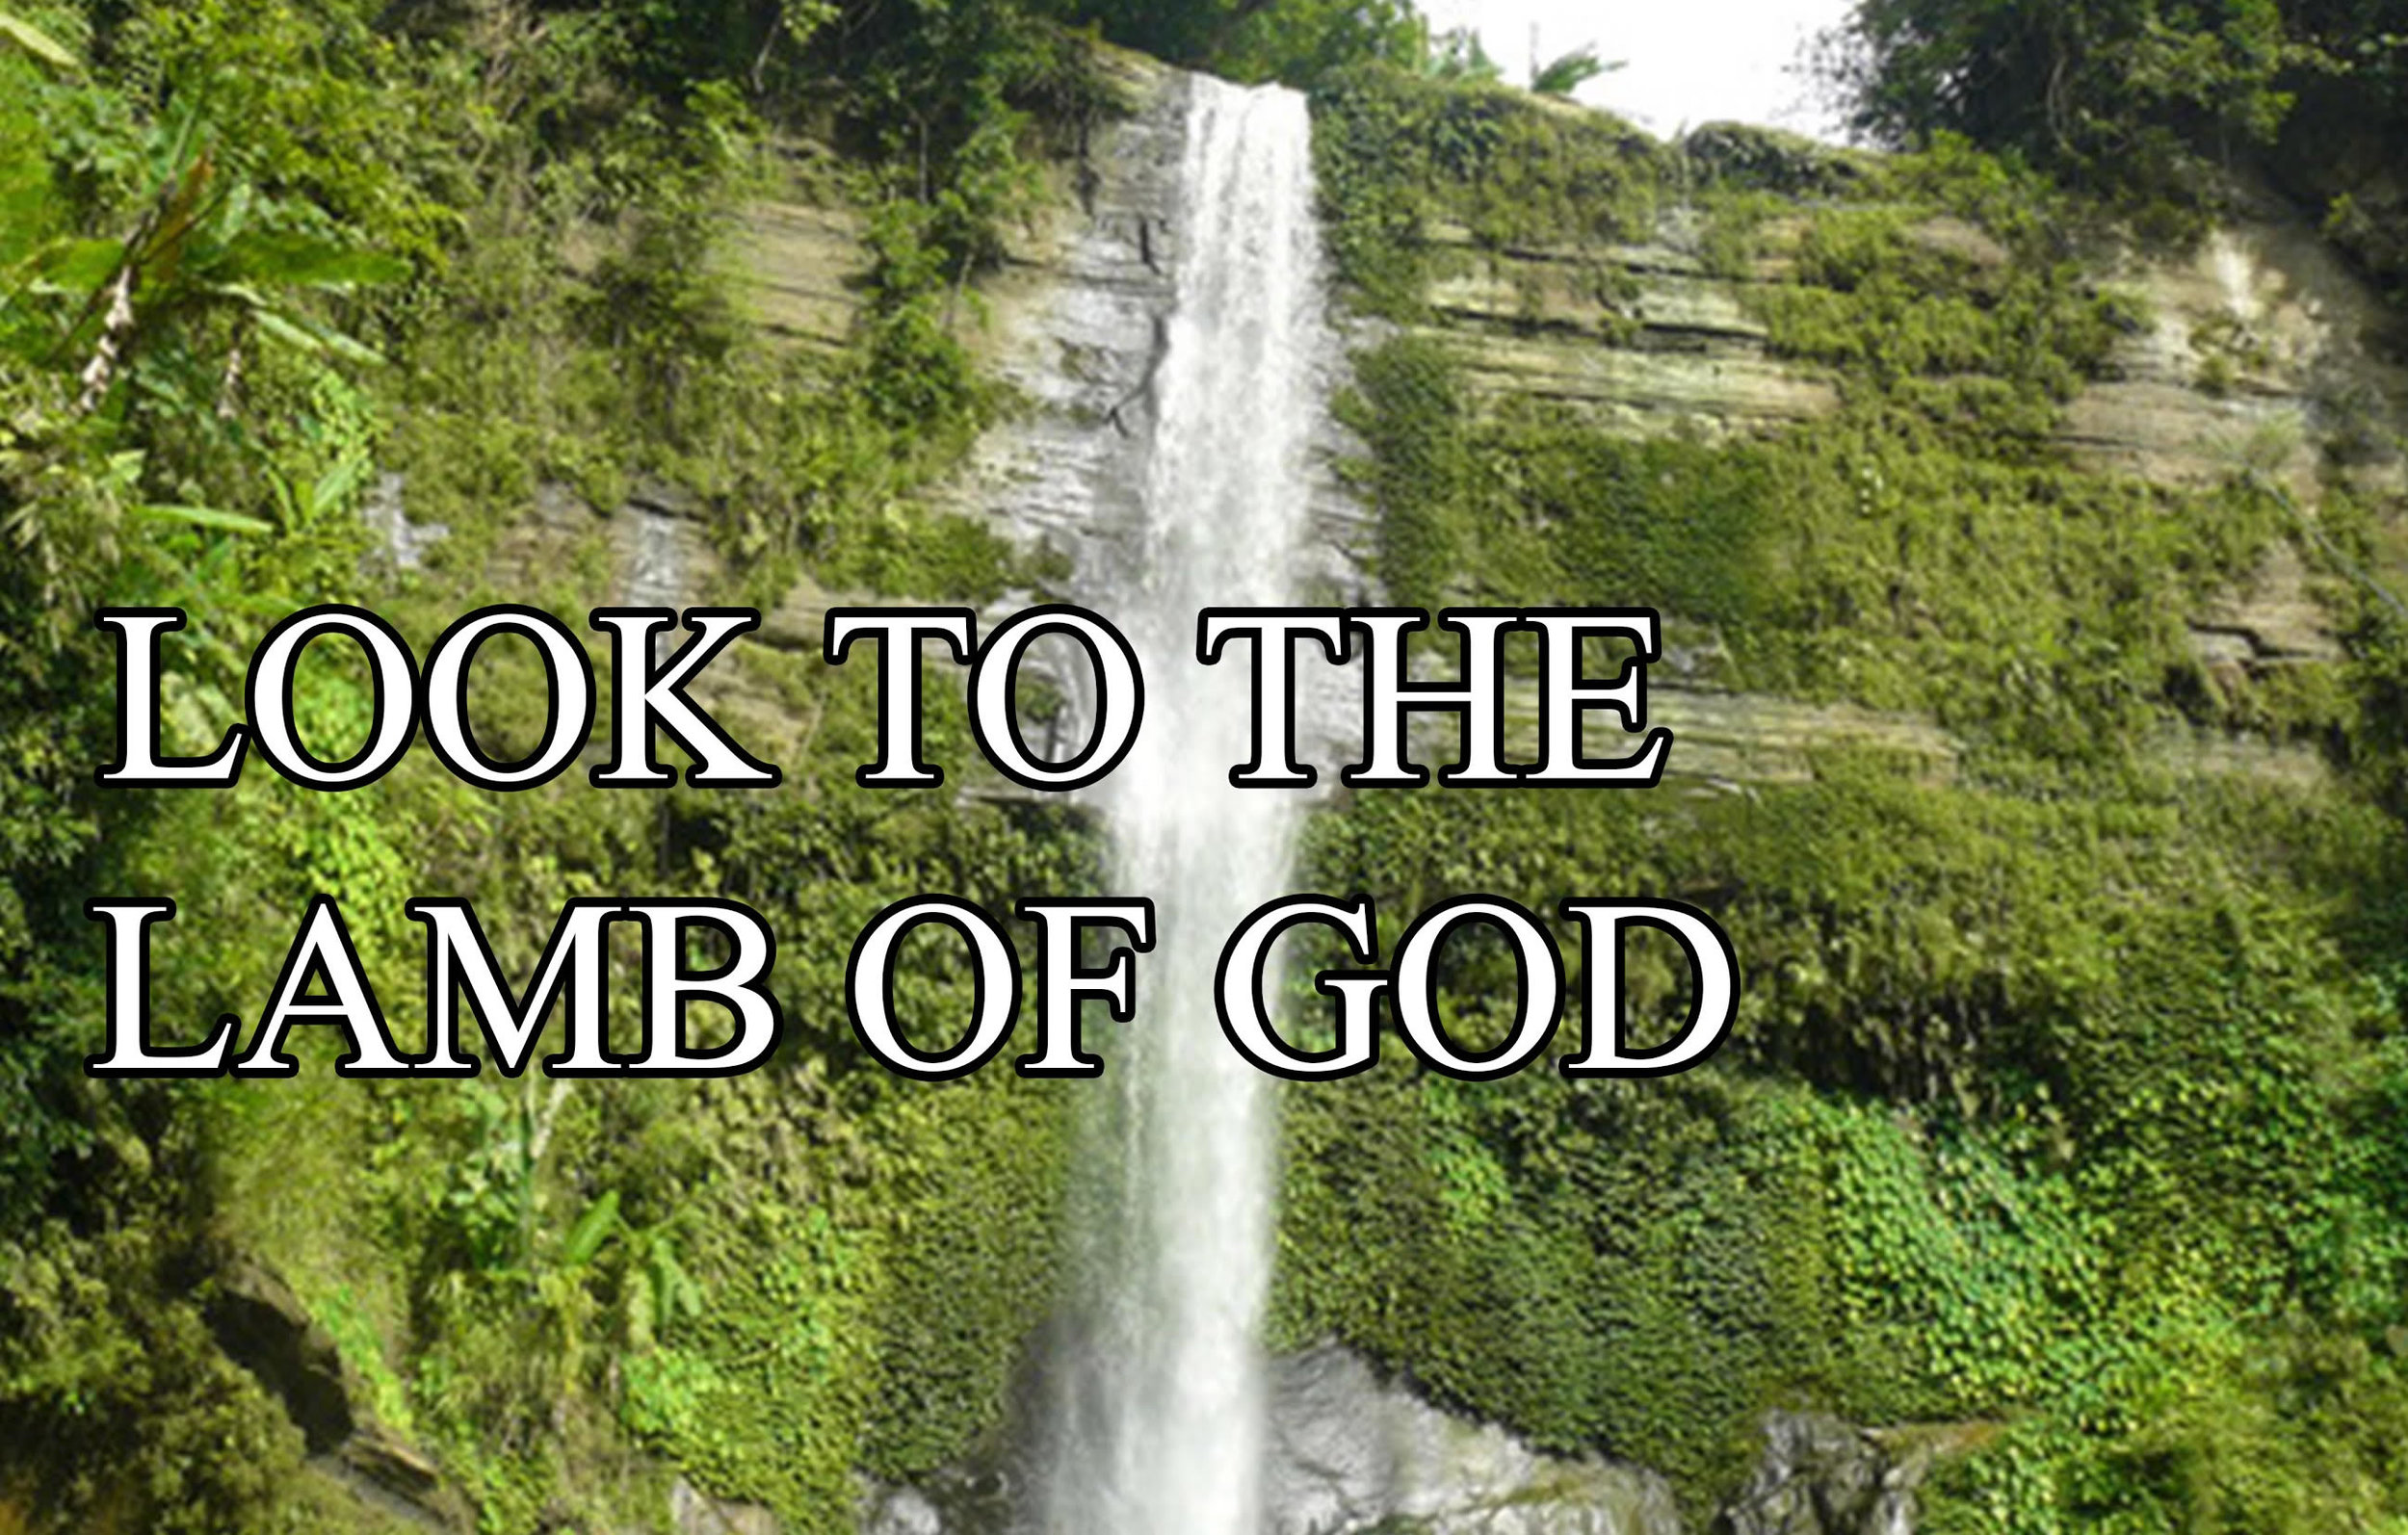 lamb of god.jpg